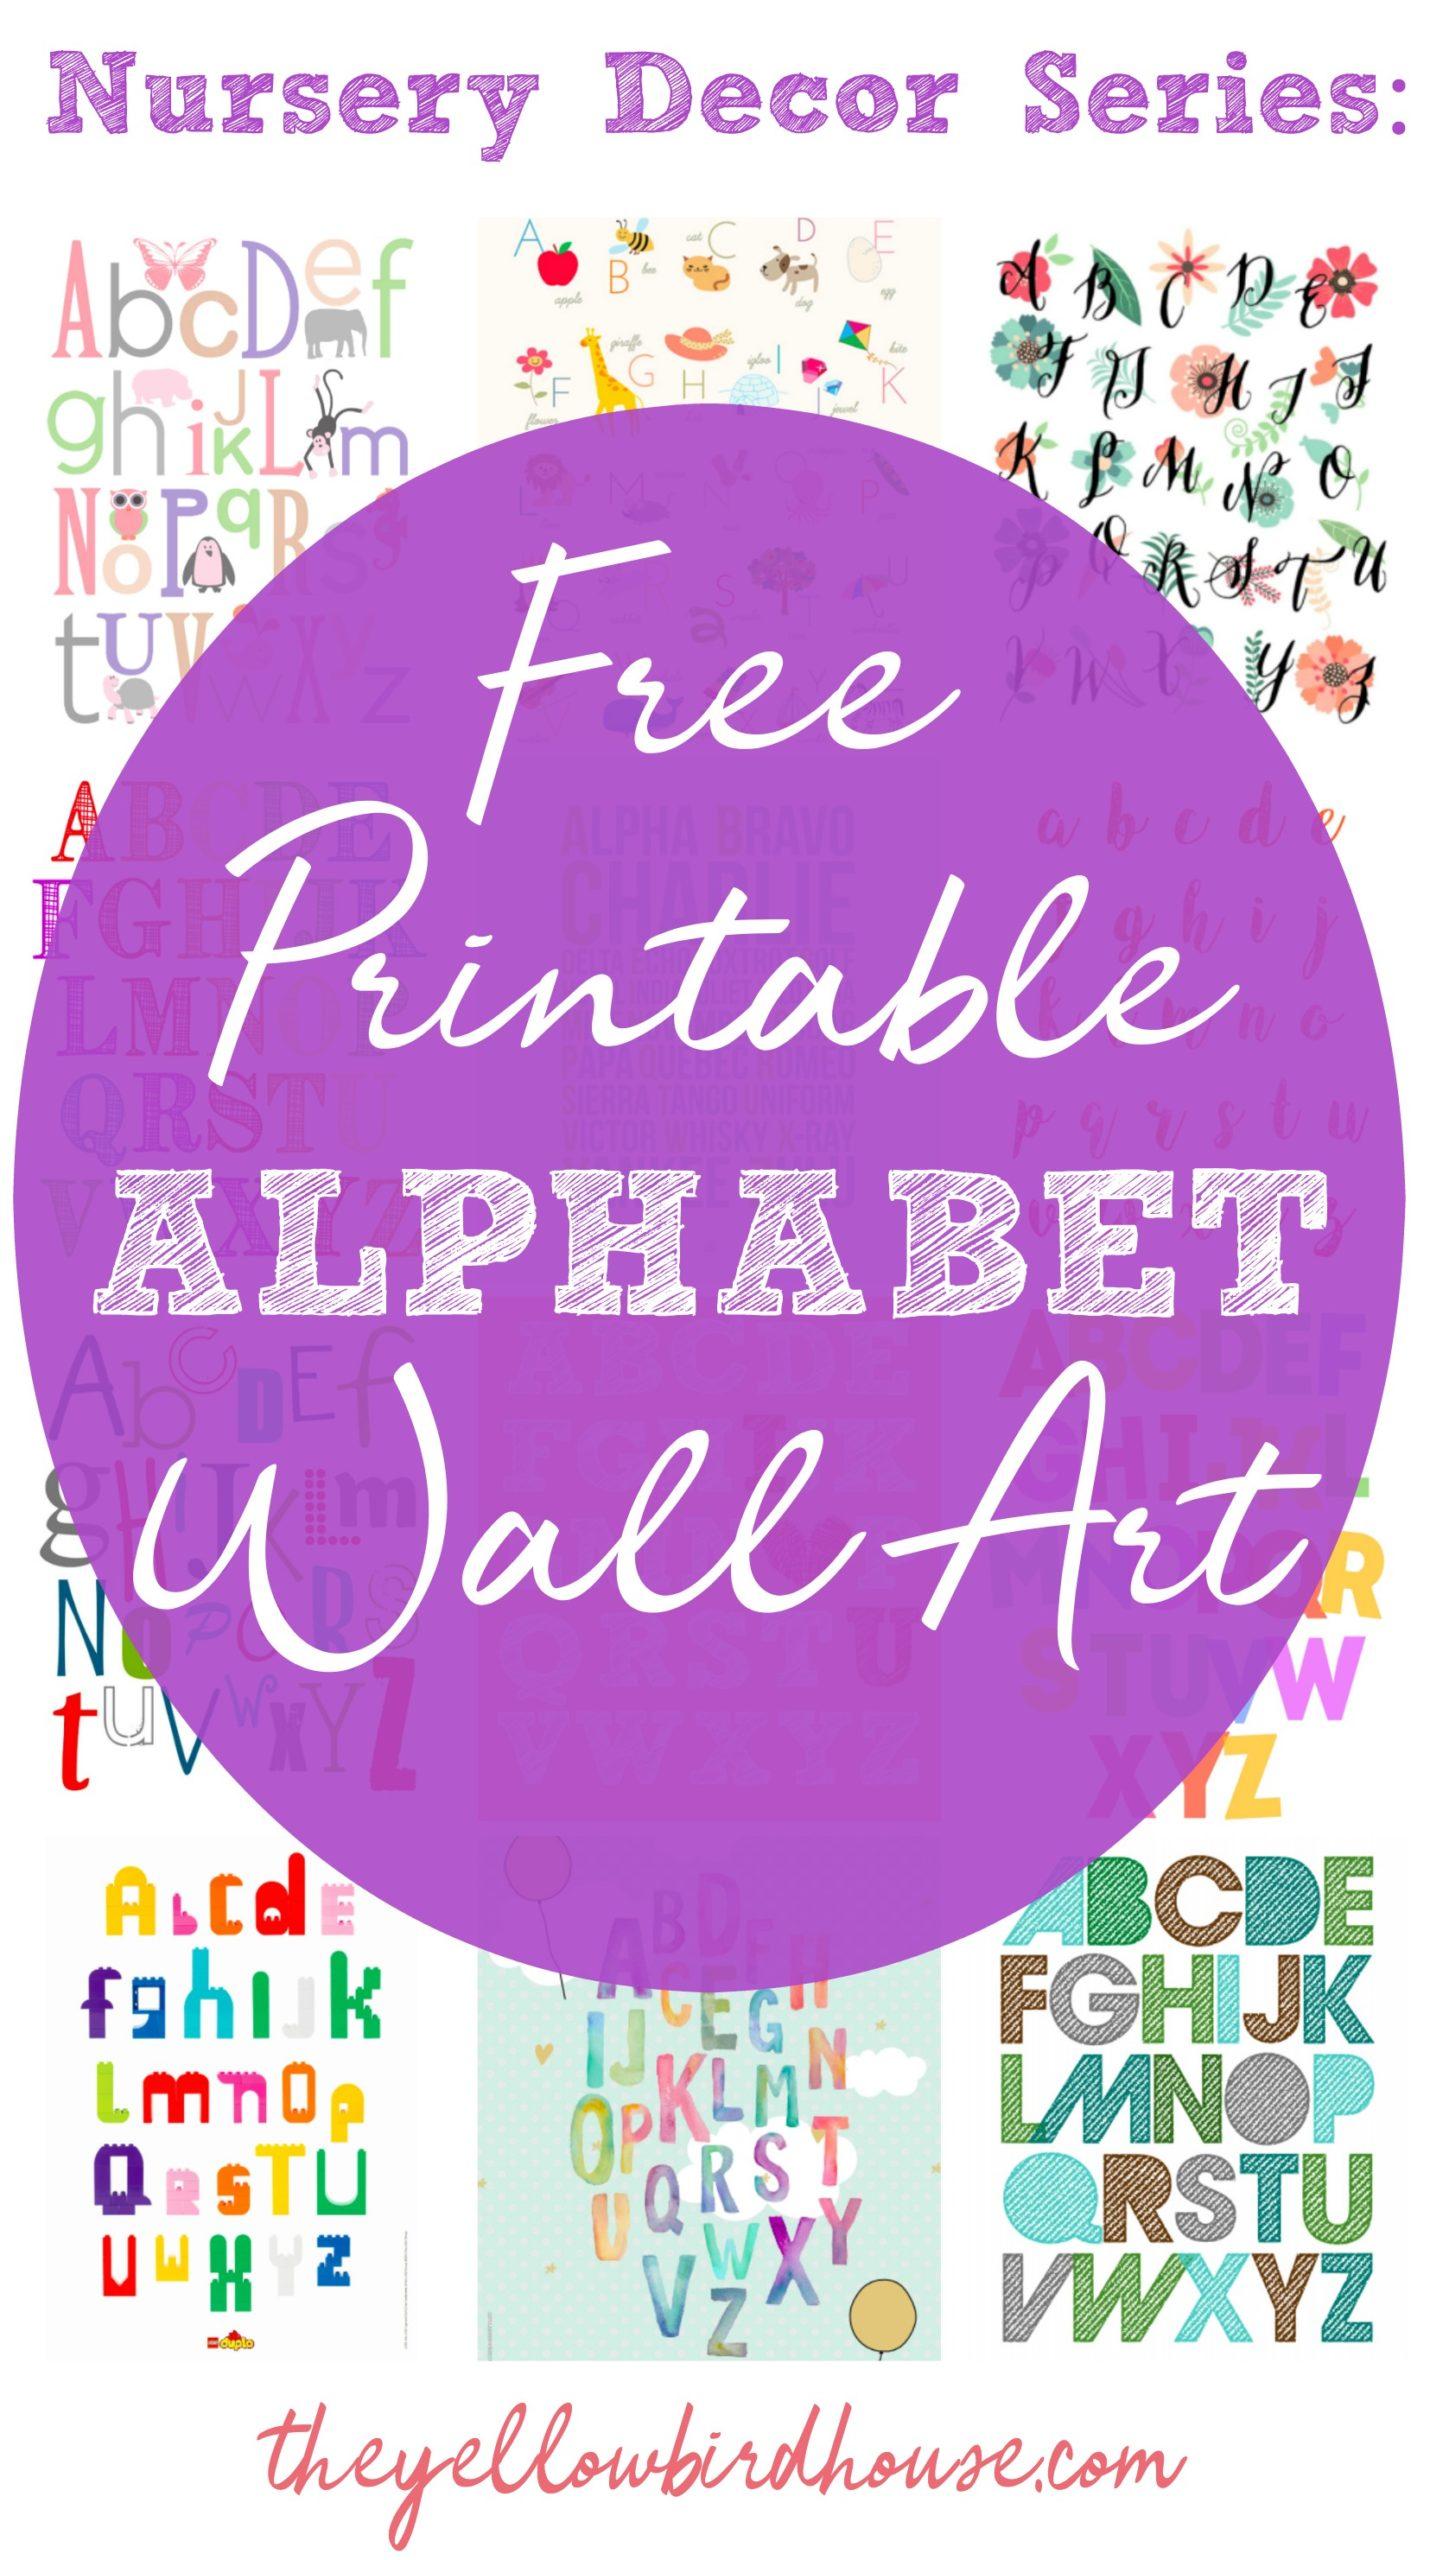 Nursery Decor Series 19 Free Printable Alphabet Wall Art Pieces